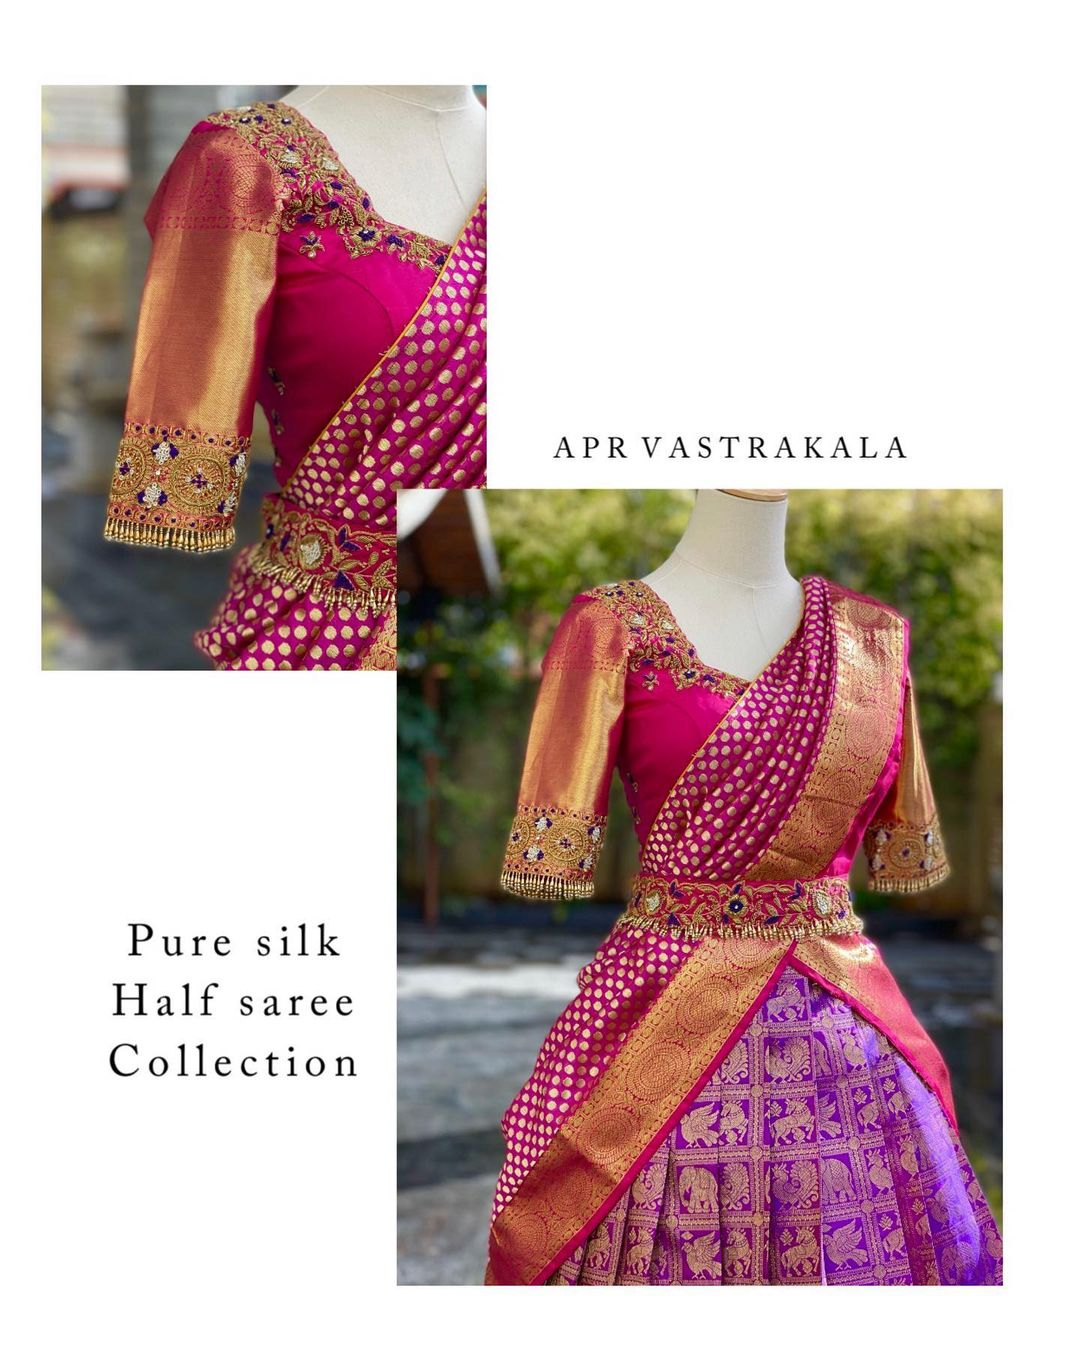 Pure kanchi pattu halfsaree !!! Gorgeous purple pure big boarder kanchi pattu lehenga and pink blouse with pure pattu dupatta. Blouse with gold jari sleeves. Blouse with hand embroidery work.  2021-06-23